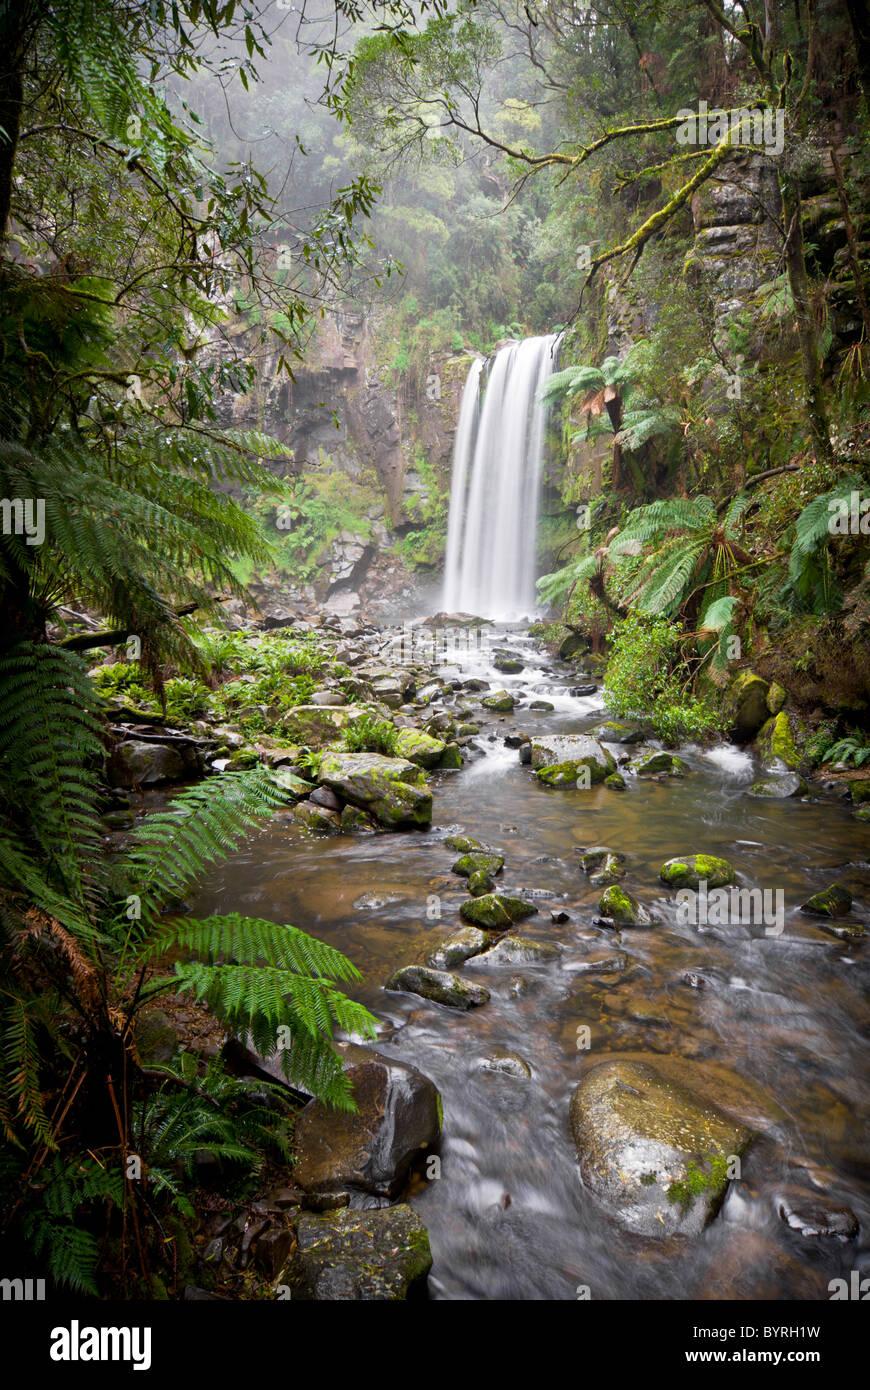 Hopetoun Falls in the Otways rainforest - Stock Image